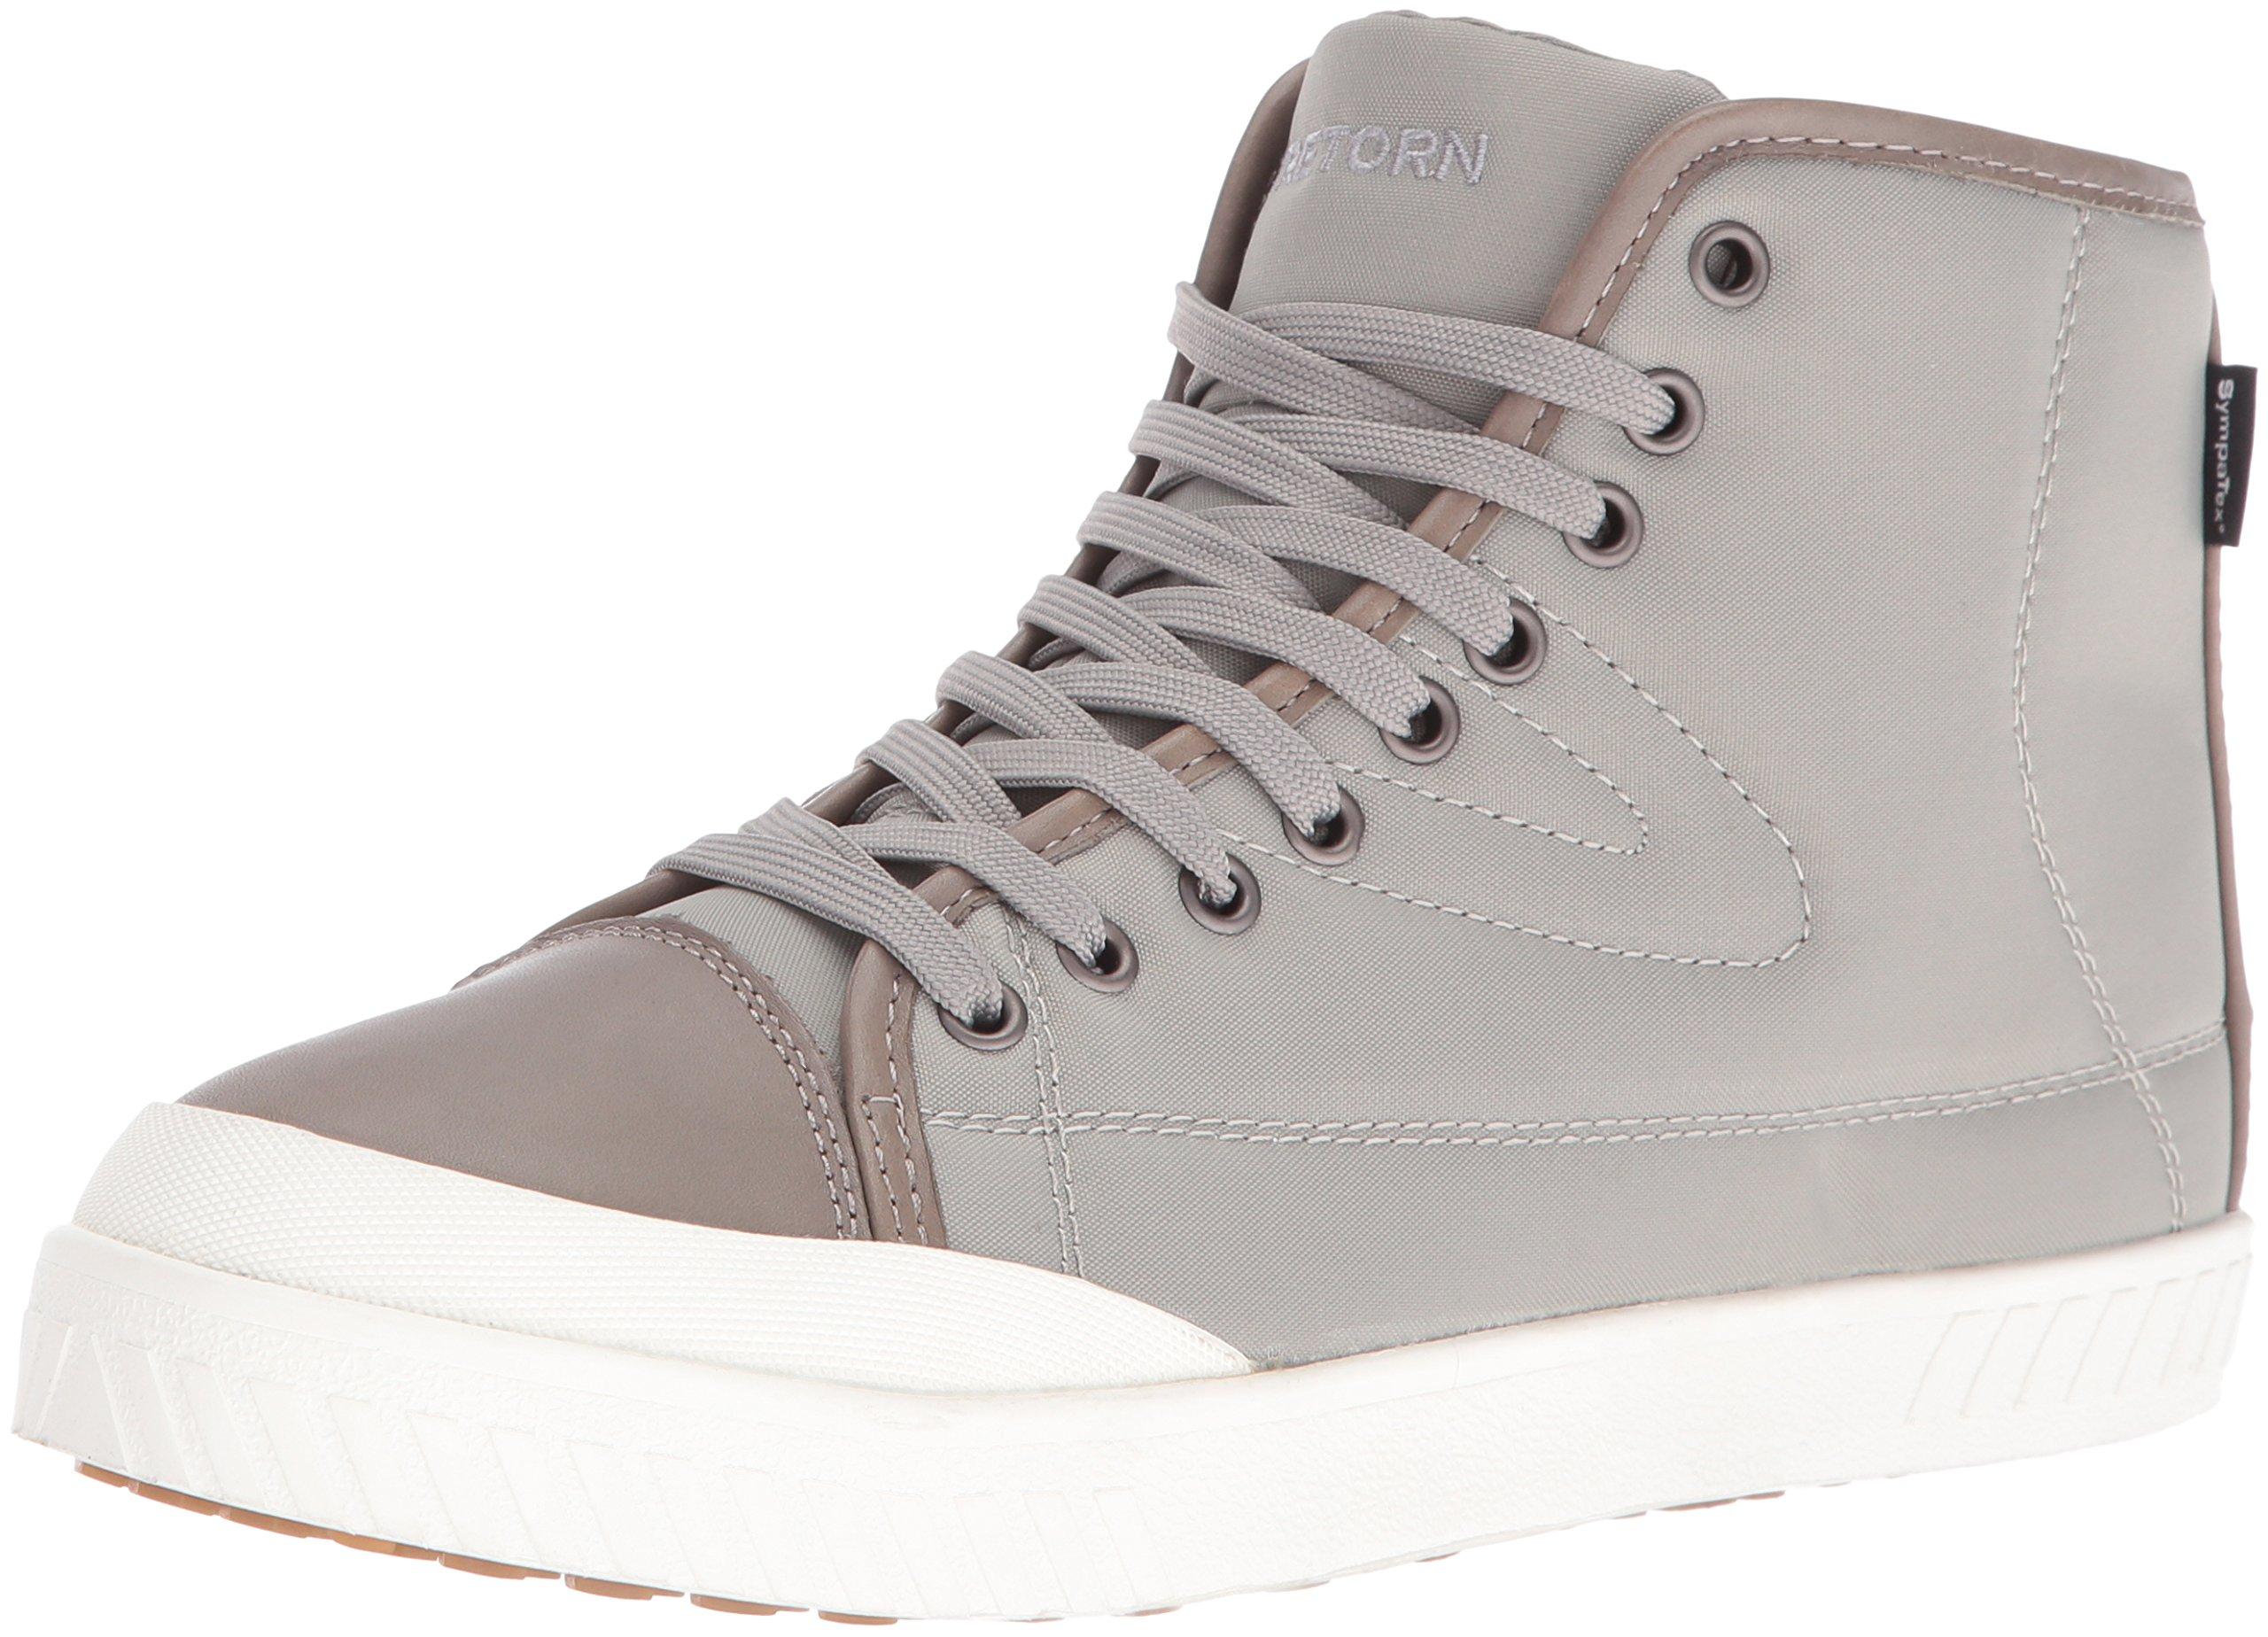 Tretorn Women's Bailey4 Rain Boot, Grey/Grey/White, 9.5 M US